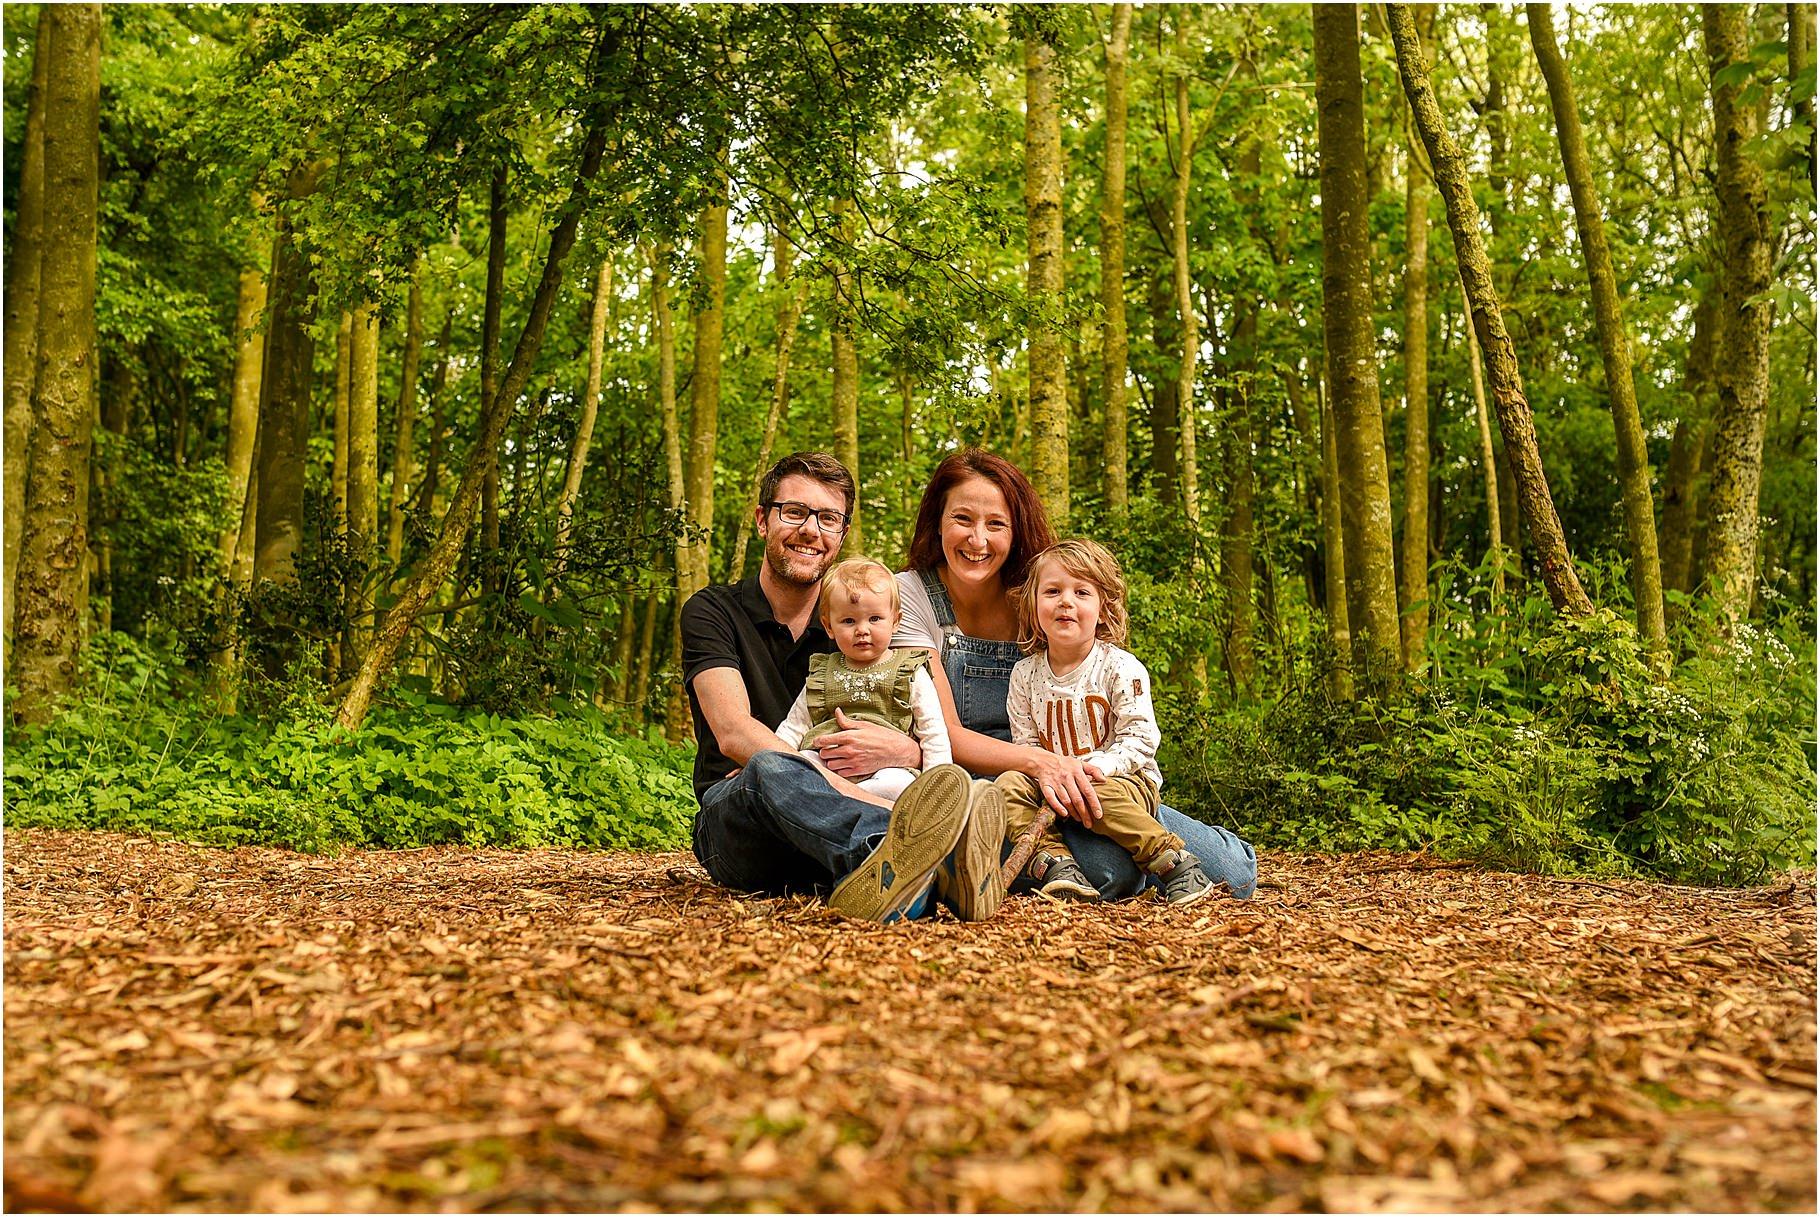 lancashire-family-photographer-16.jpg